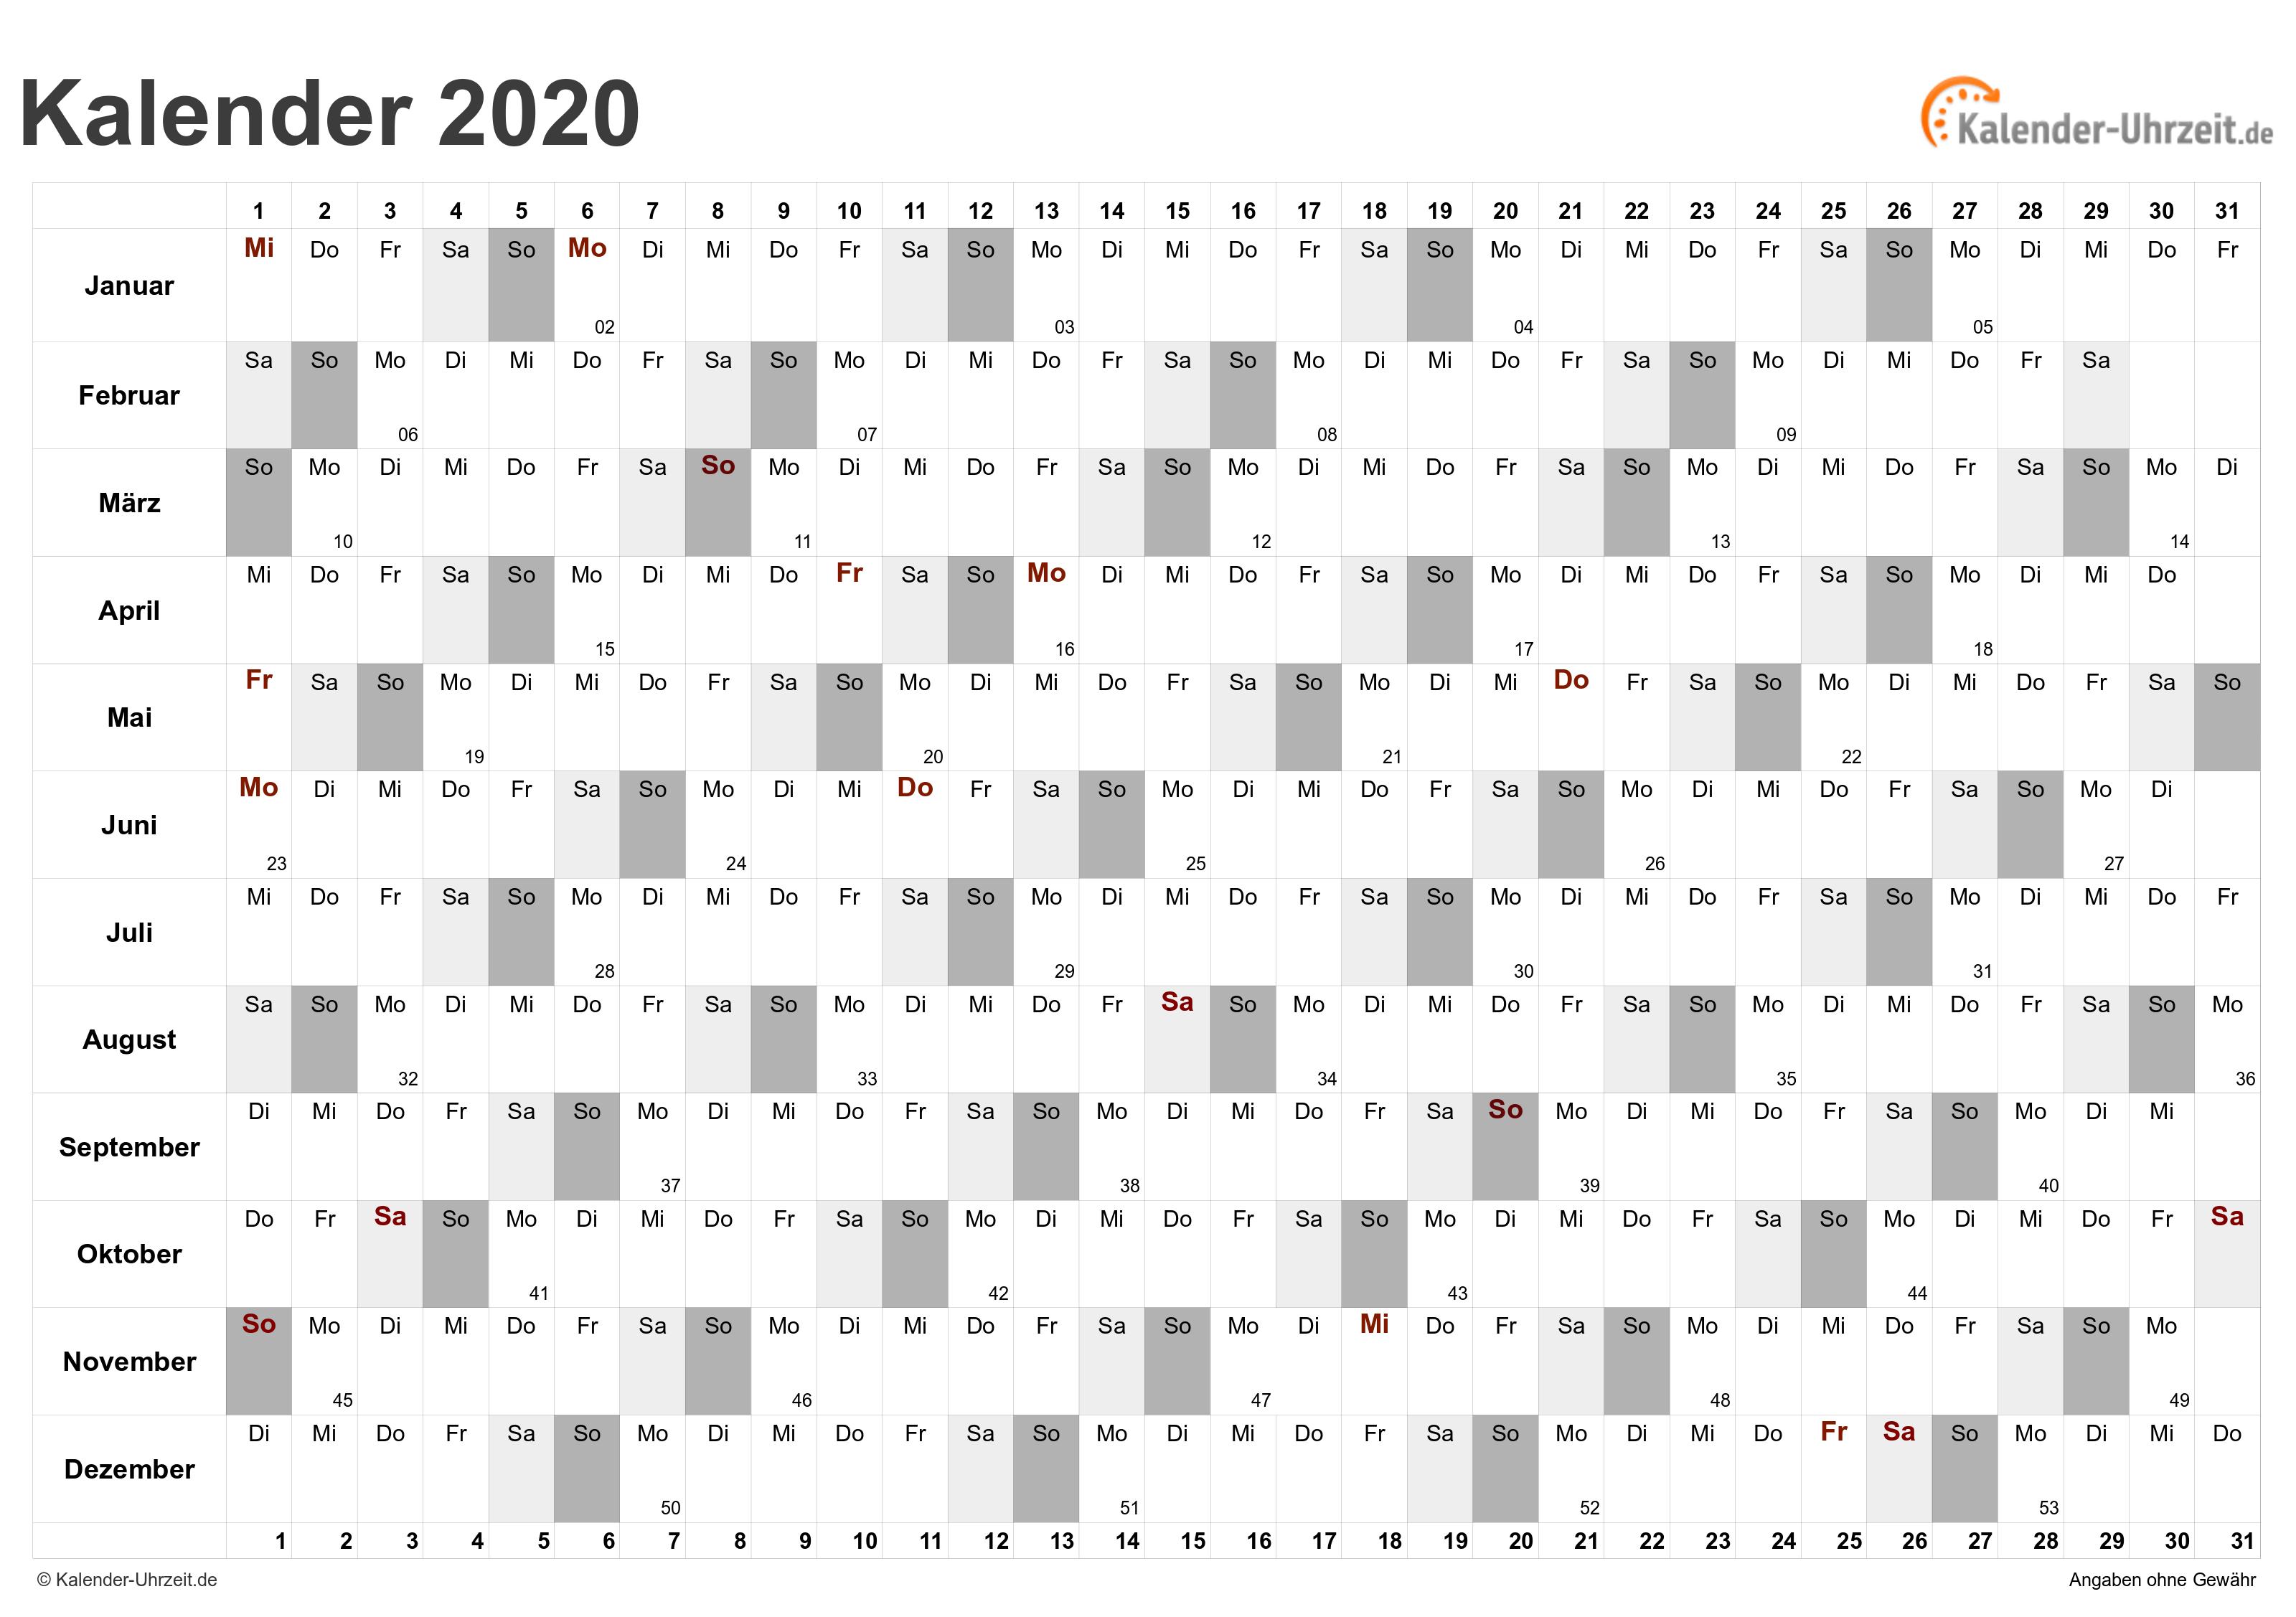 Excel Kalender 2020 Kostenlos